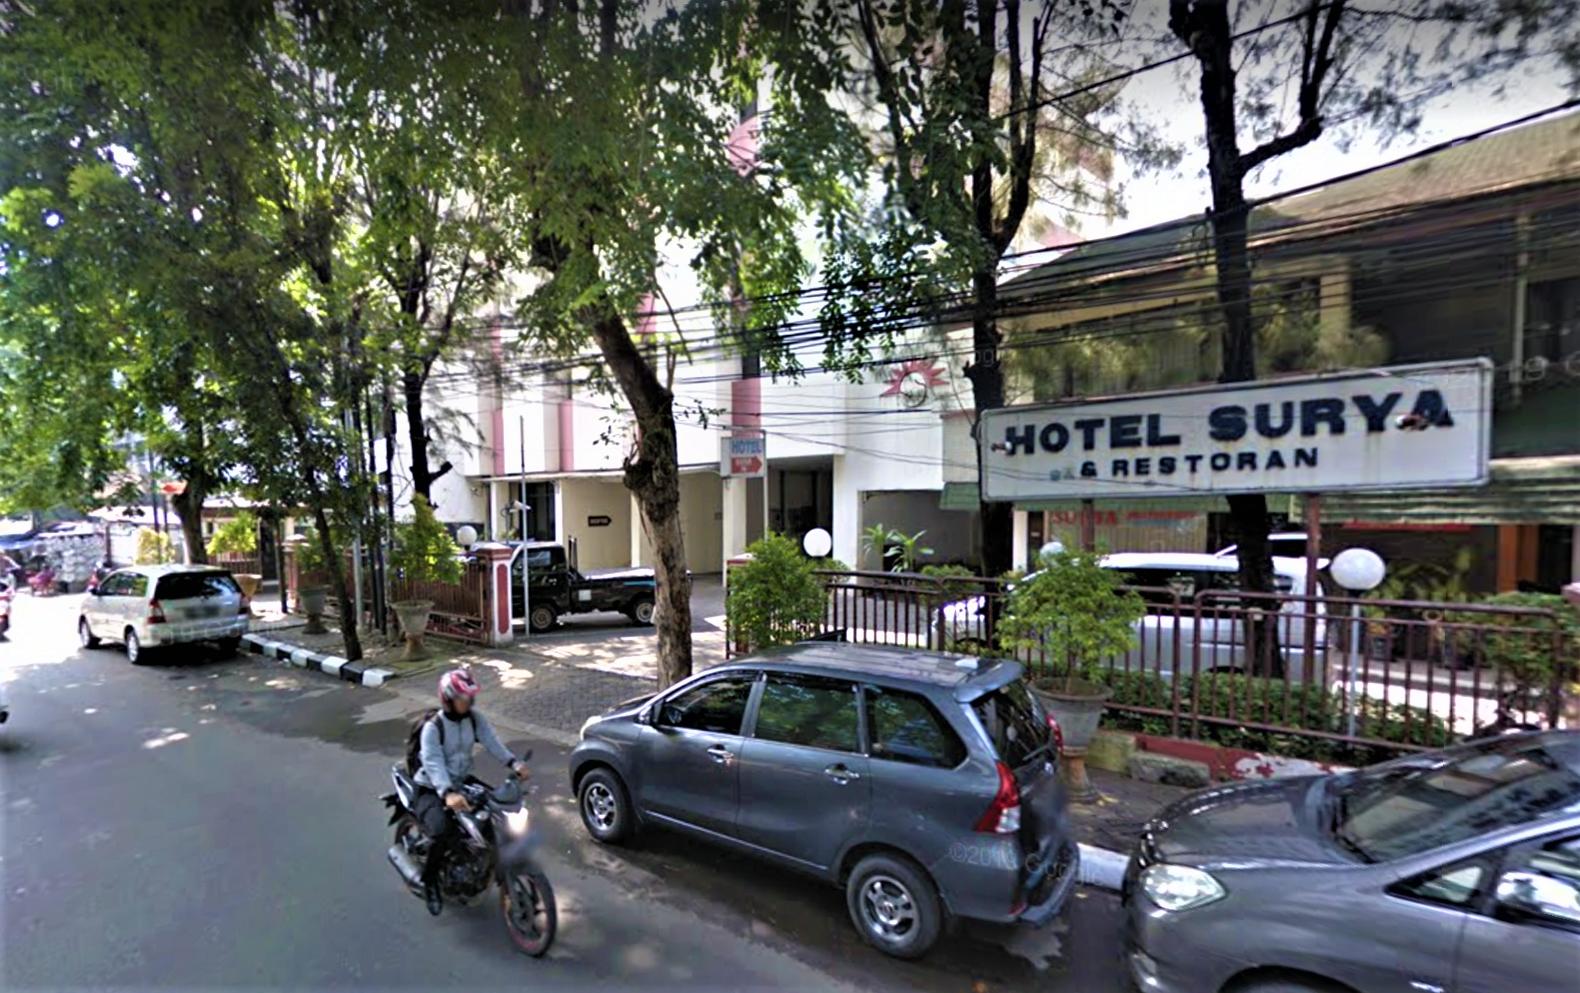 Hotel-surya_1